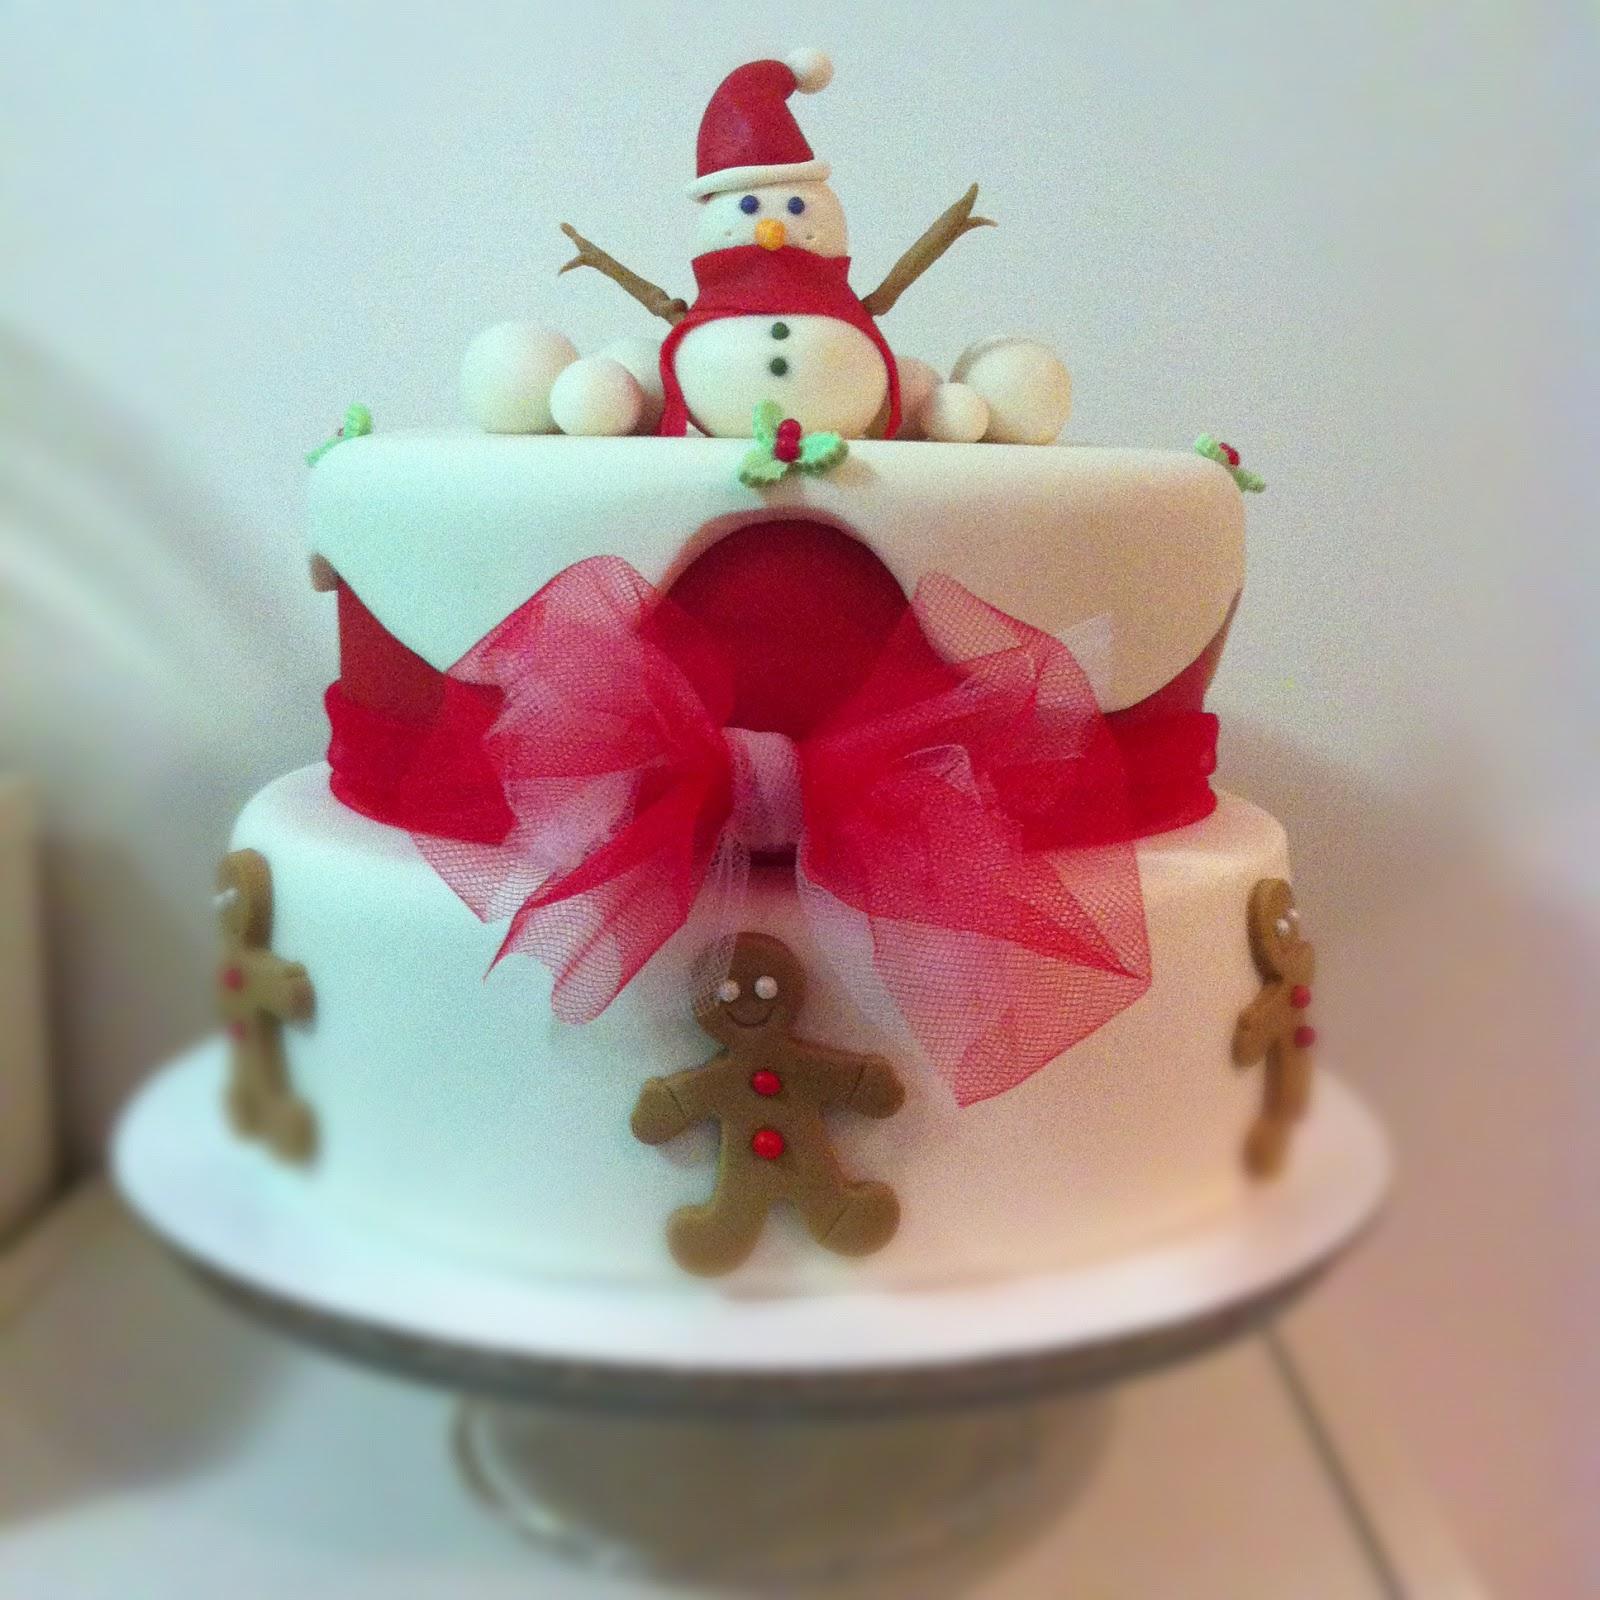 Sweet cuc 39 s cake torta a due piani corso intermedio natale - Decorazioni torte natalizie ...